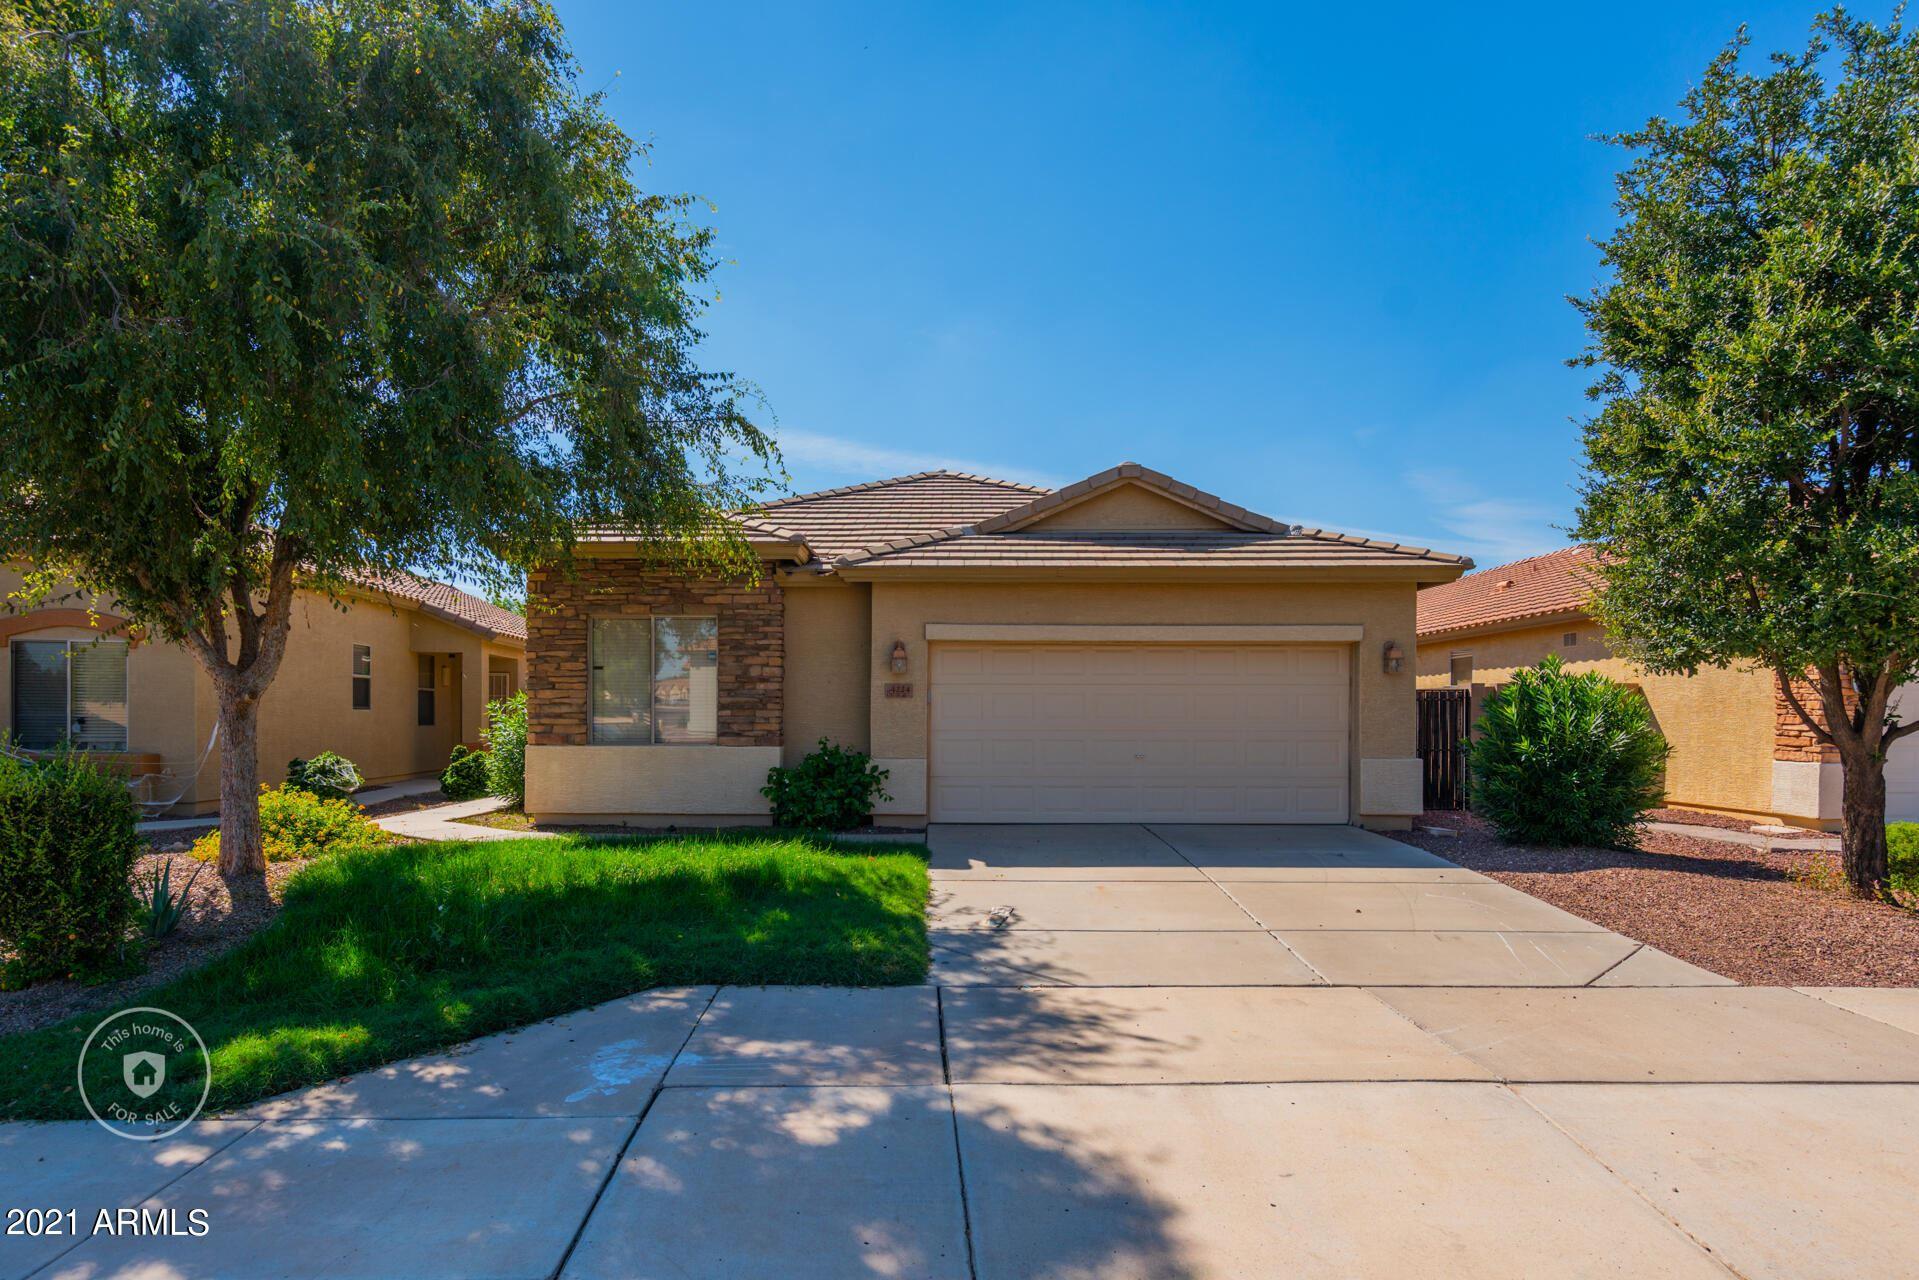 Photo of 4224 N 129TH Avenue, Litchfield Park, AZ 85340 (MLS # 6305164)